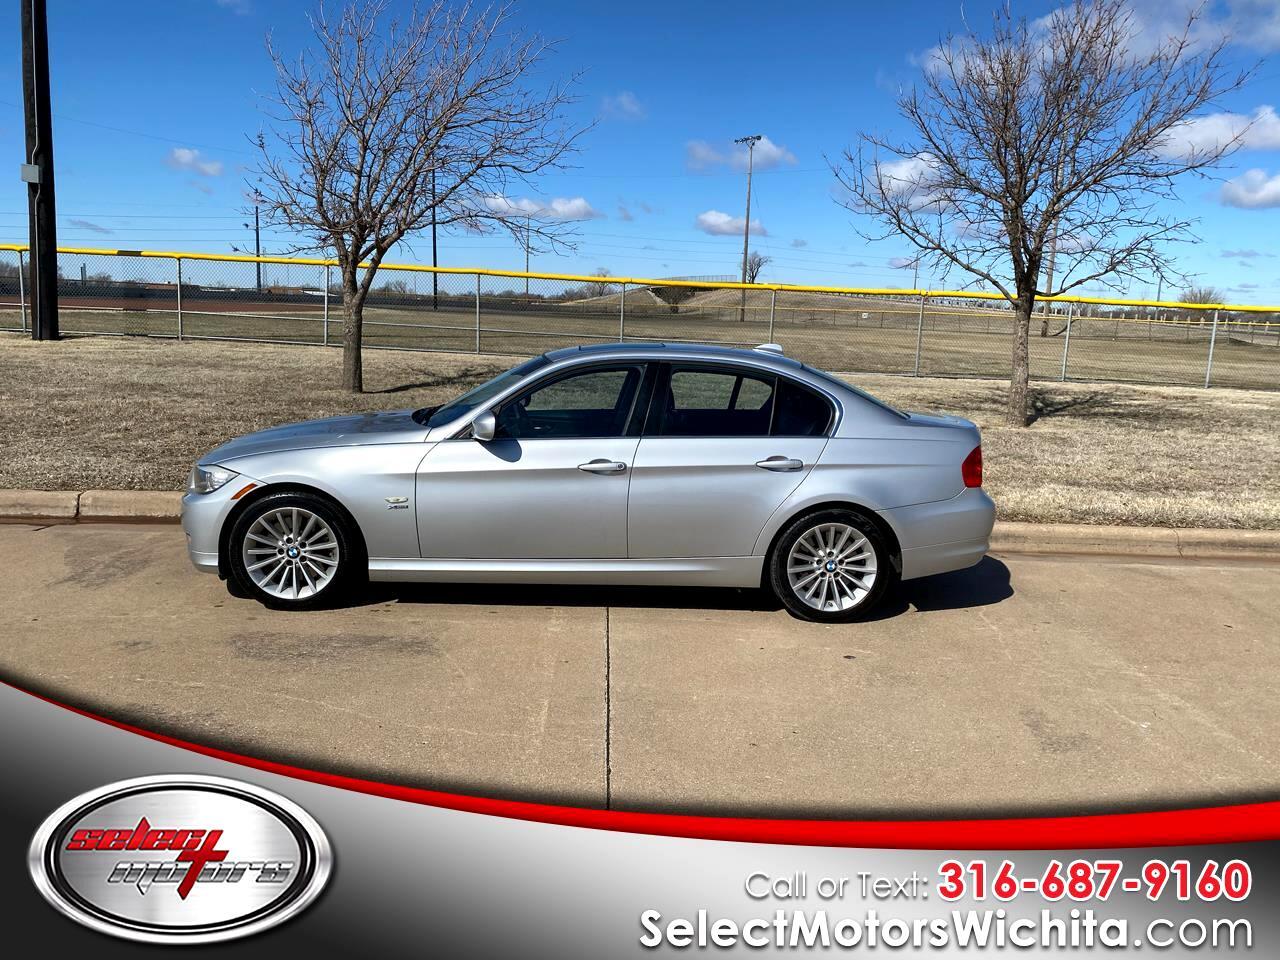 BMW 3 Series 4dr Sdn 335i xDrive AWD 2009